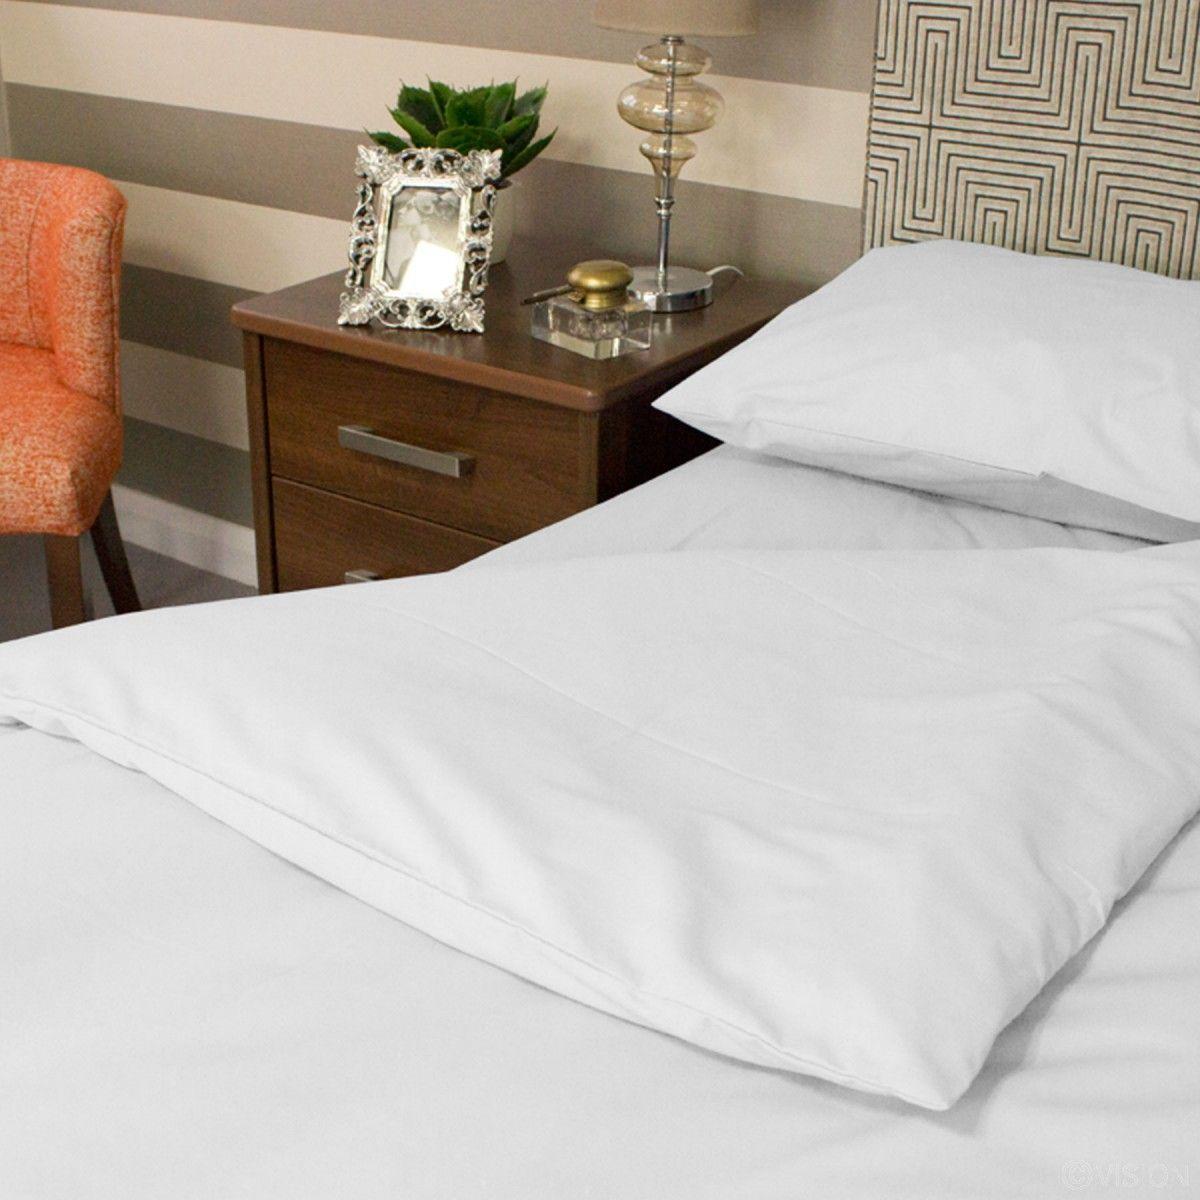 Flame retardant pillowcases & care home